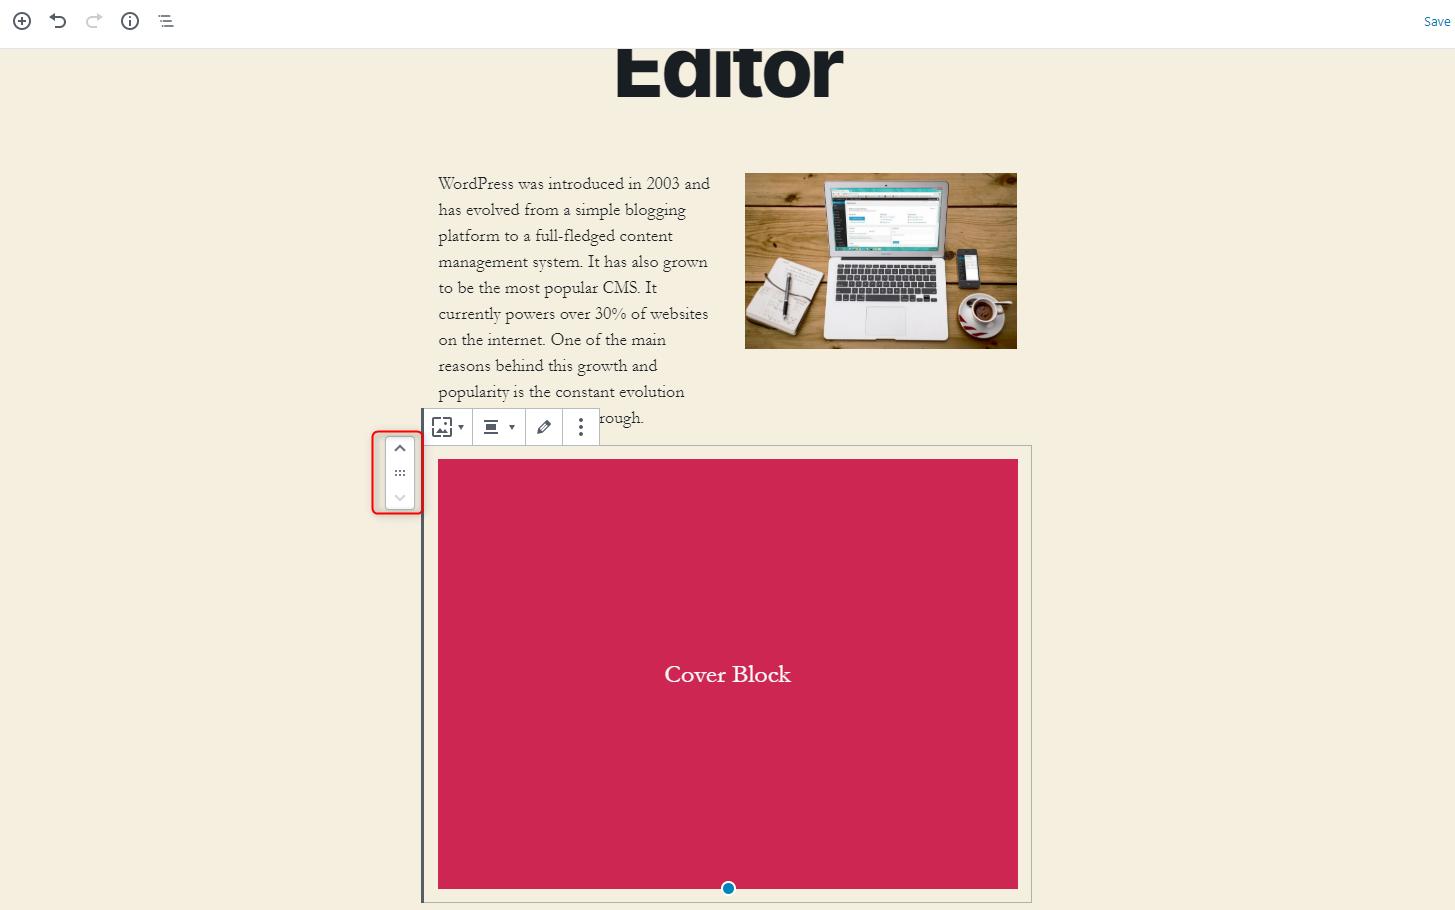 WordPress Gutenberg Editor - Changing the position of blocks